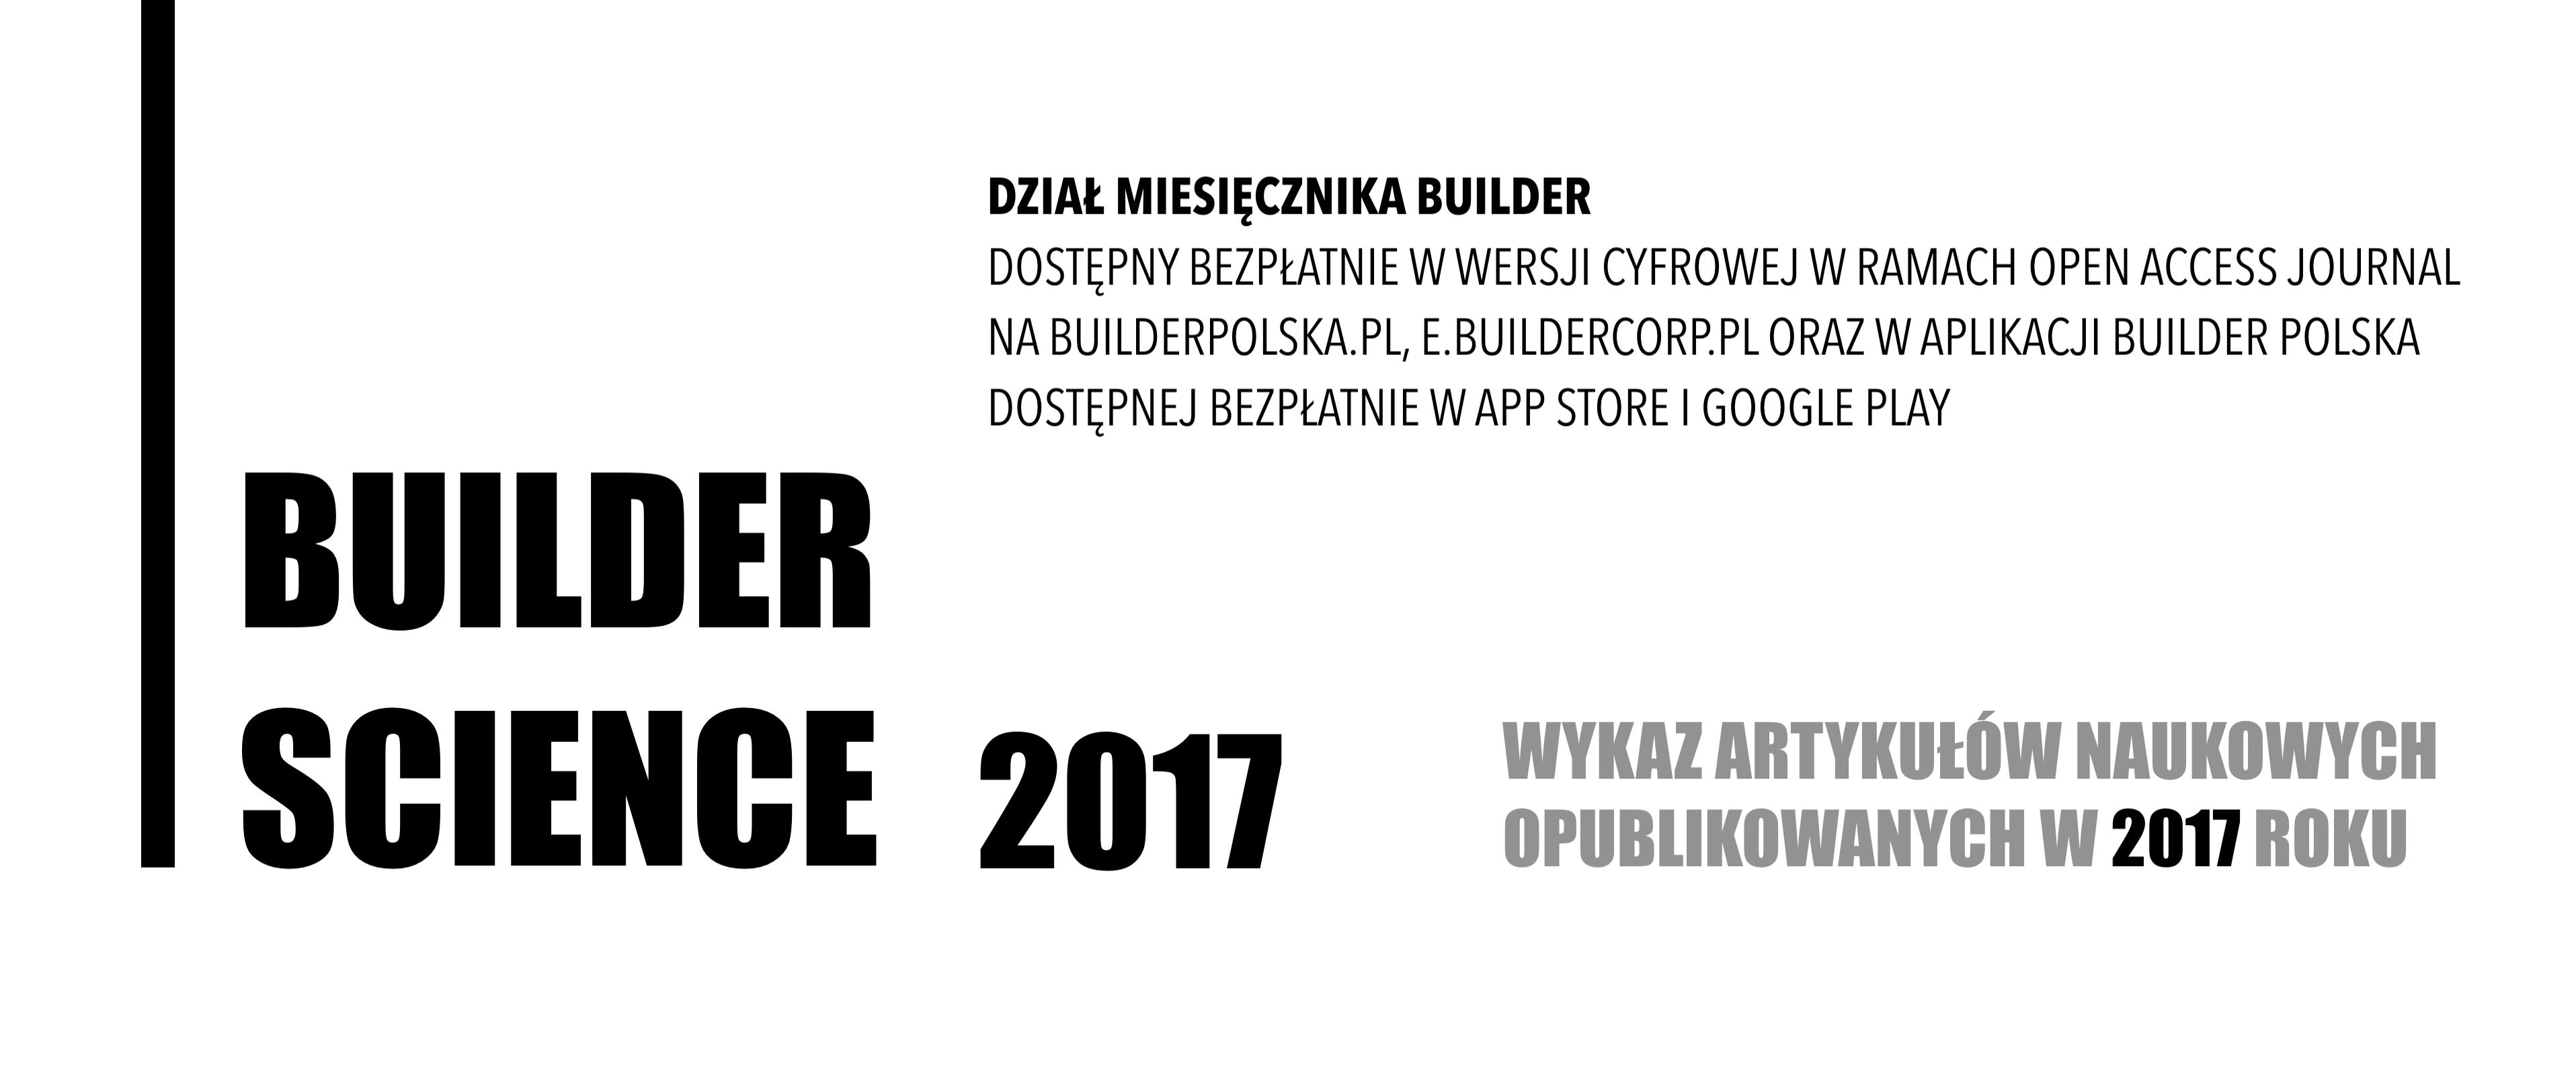 BUILDER SCIENCE  2017